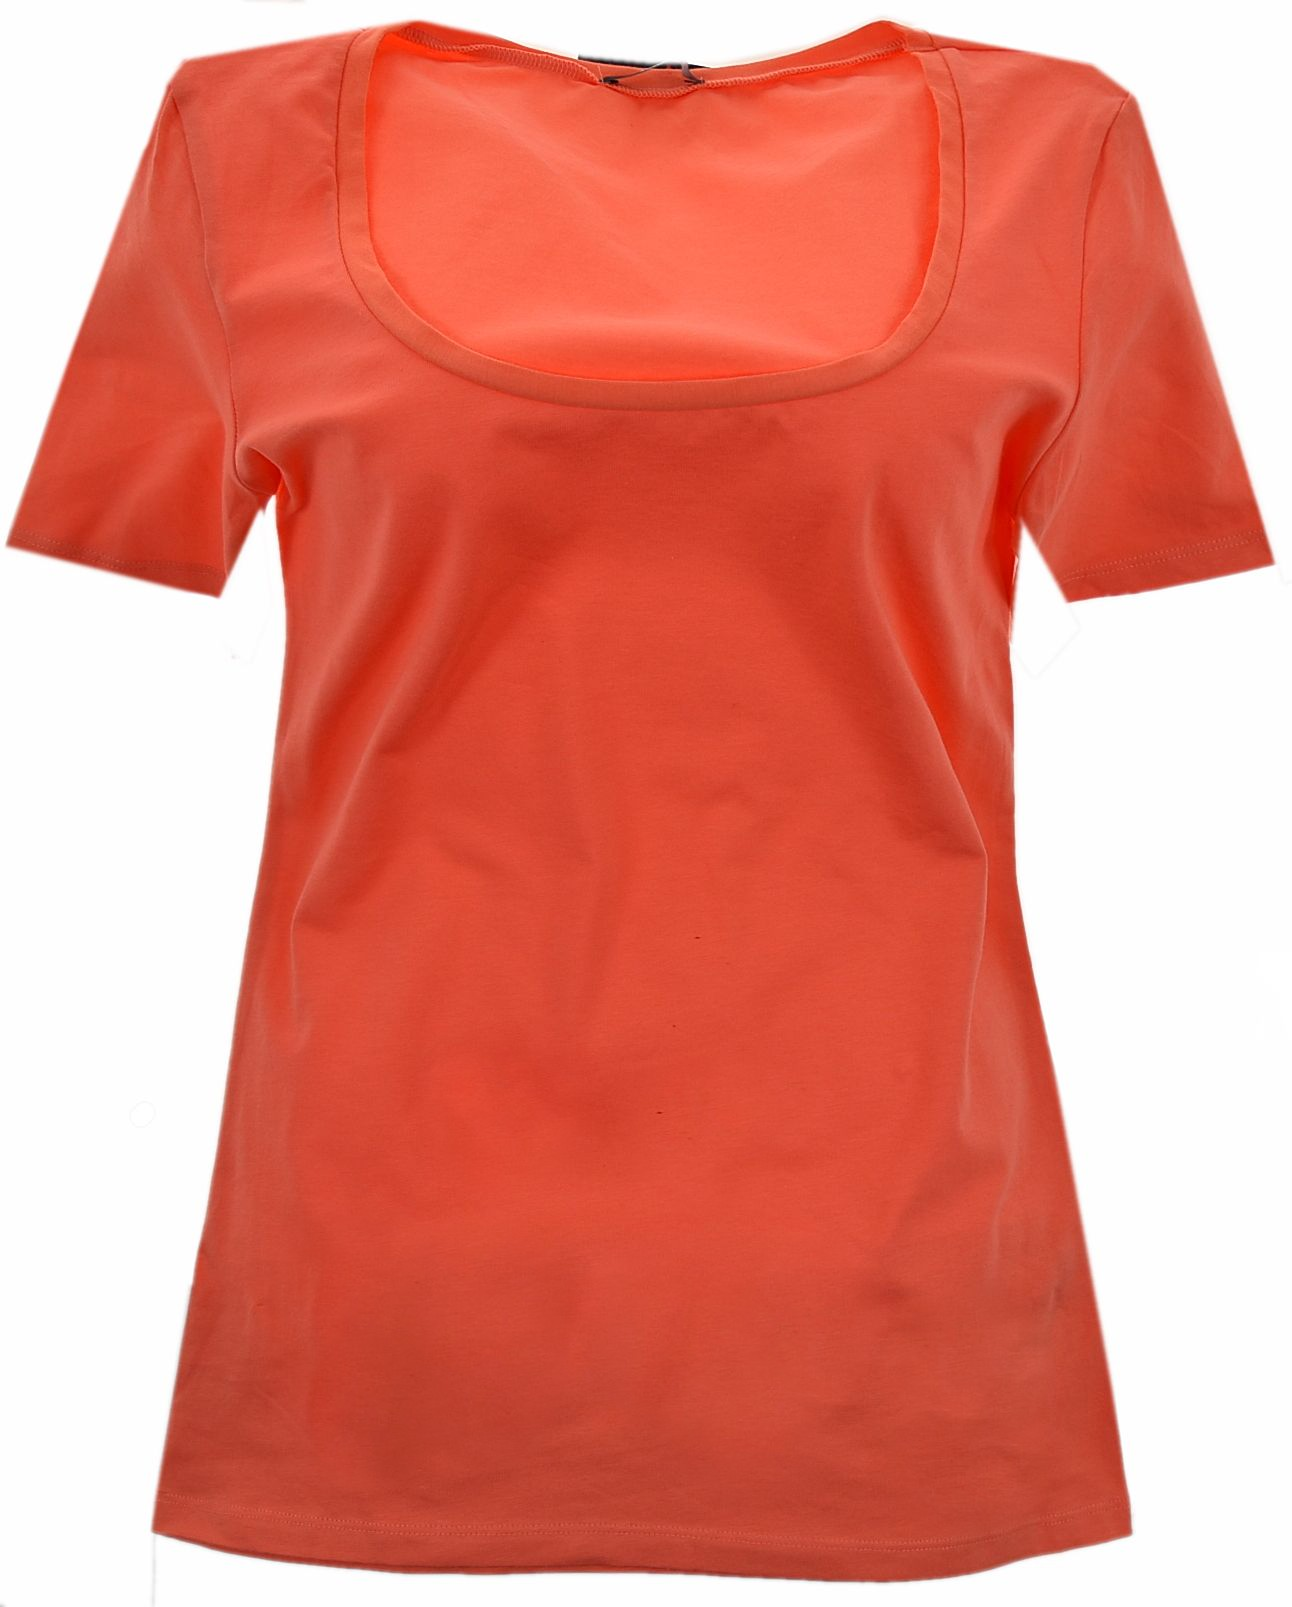 Sale Tezenis Intimissimi koszulka bluzka top S 36